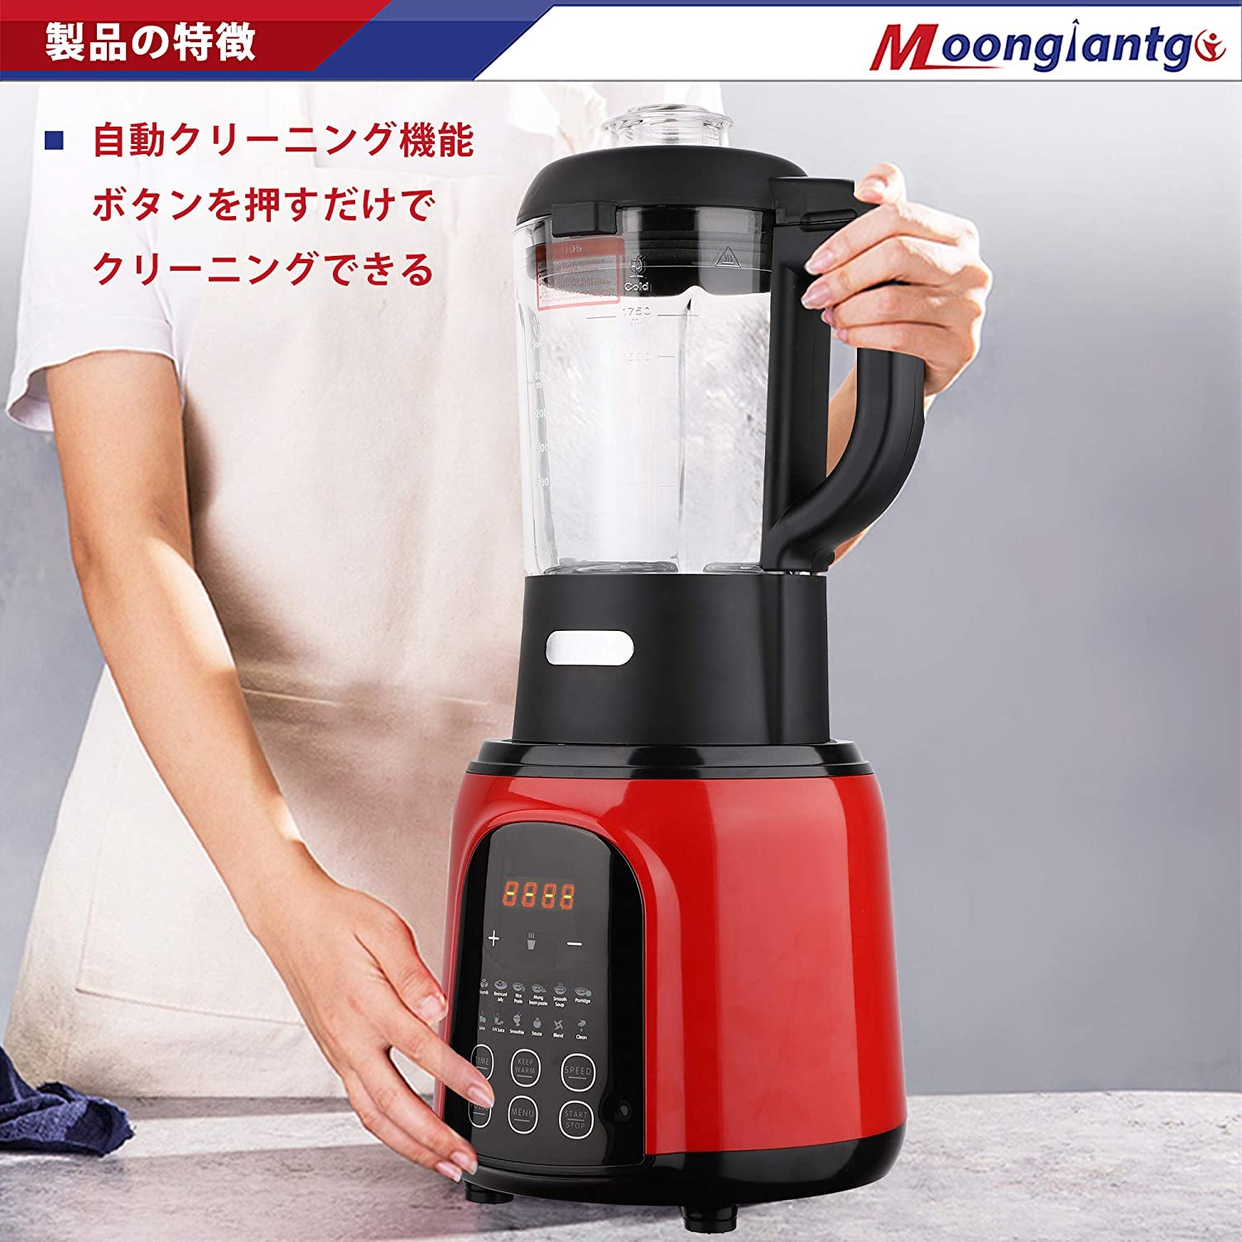 Moongiantgo(ムーンジャイアントゴー) 豆乳機 多機能調理器の商品画像4